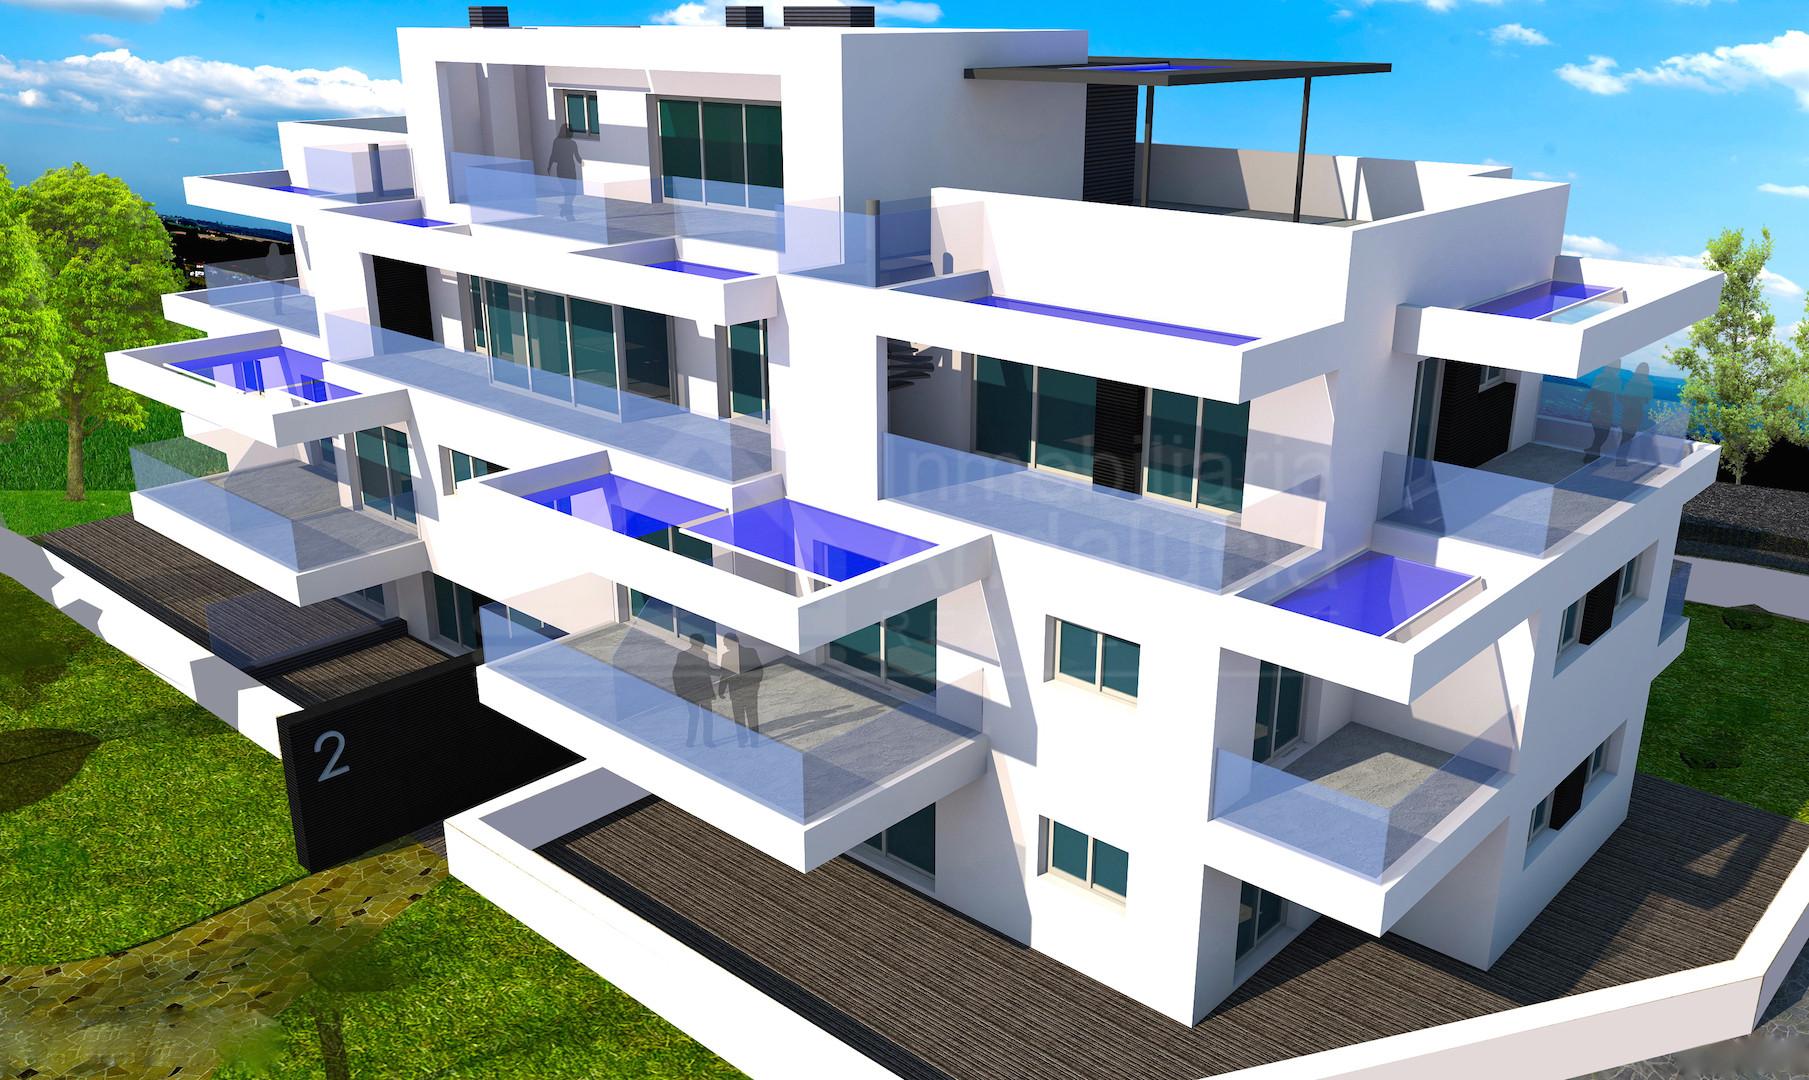 Brand new 3 bedroom 1st floor luxury apartment for sale in Estepona, close to Benahavis